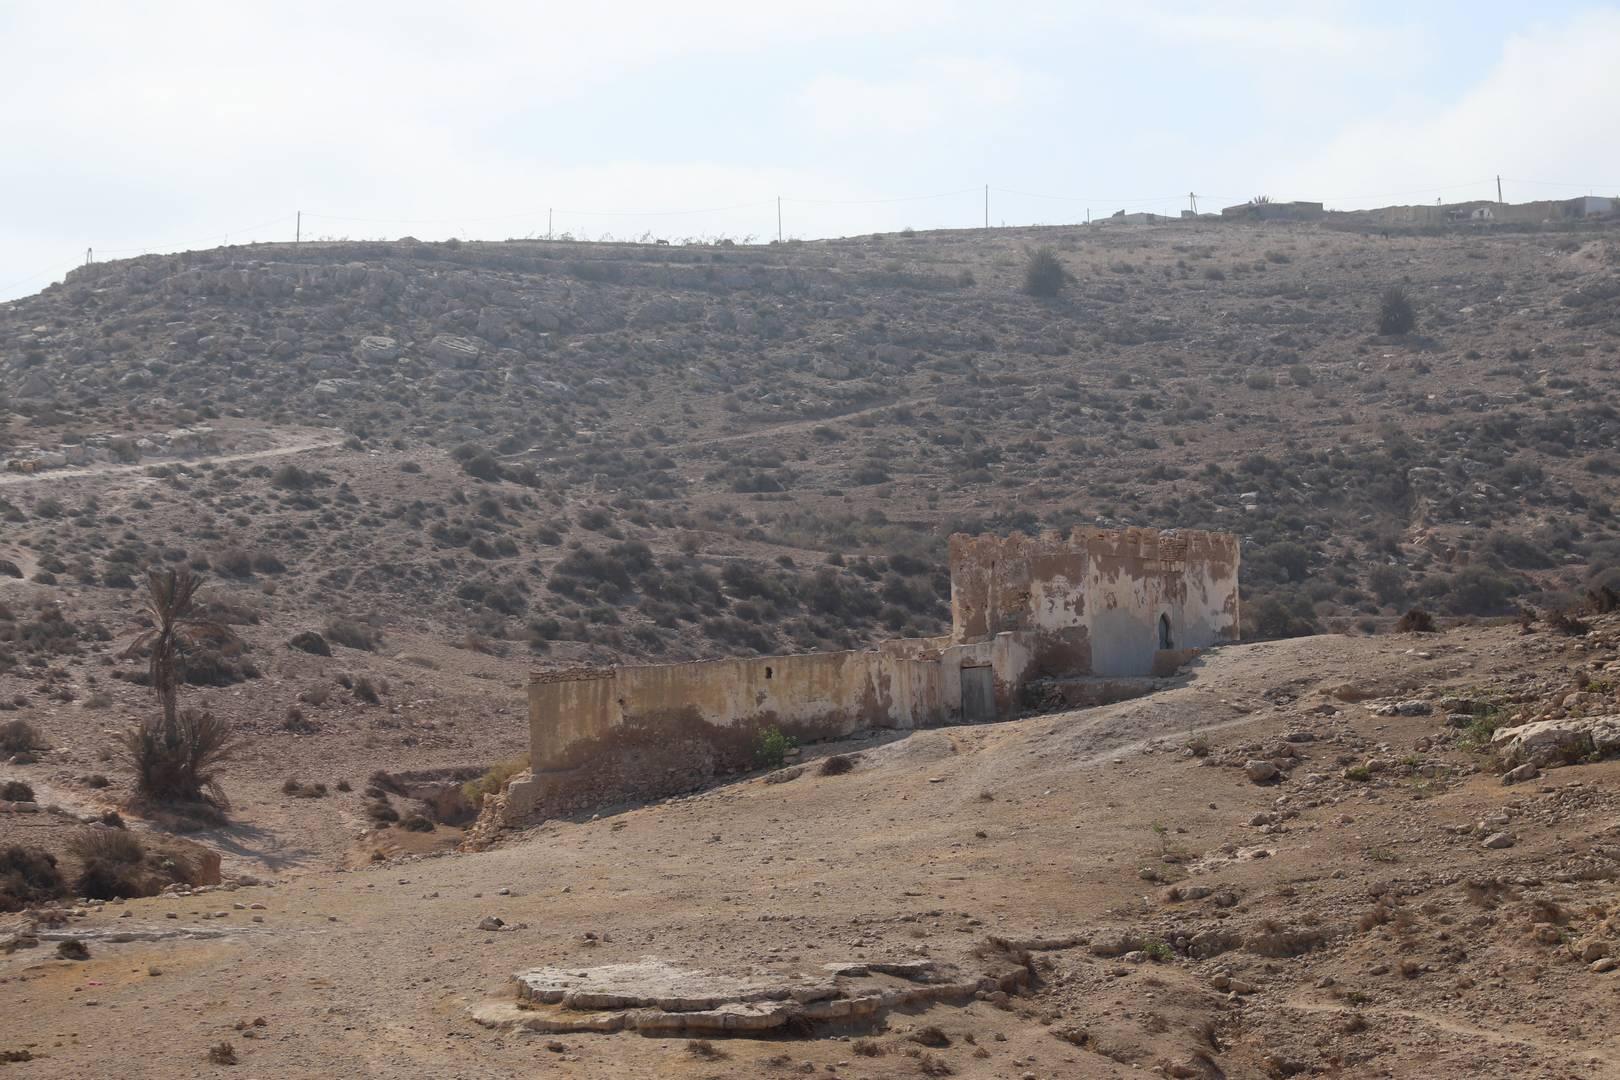 Maroc - Marabout de Sidi M'barek au Sud d'Essaouira